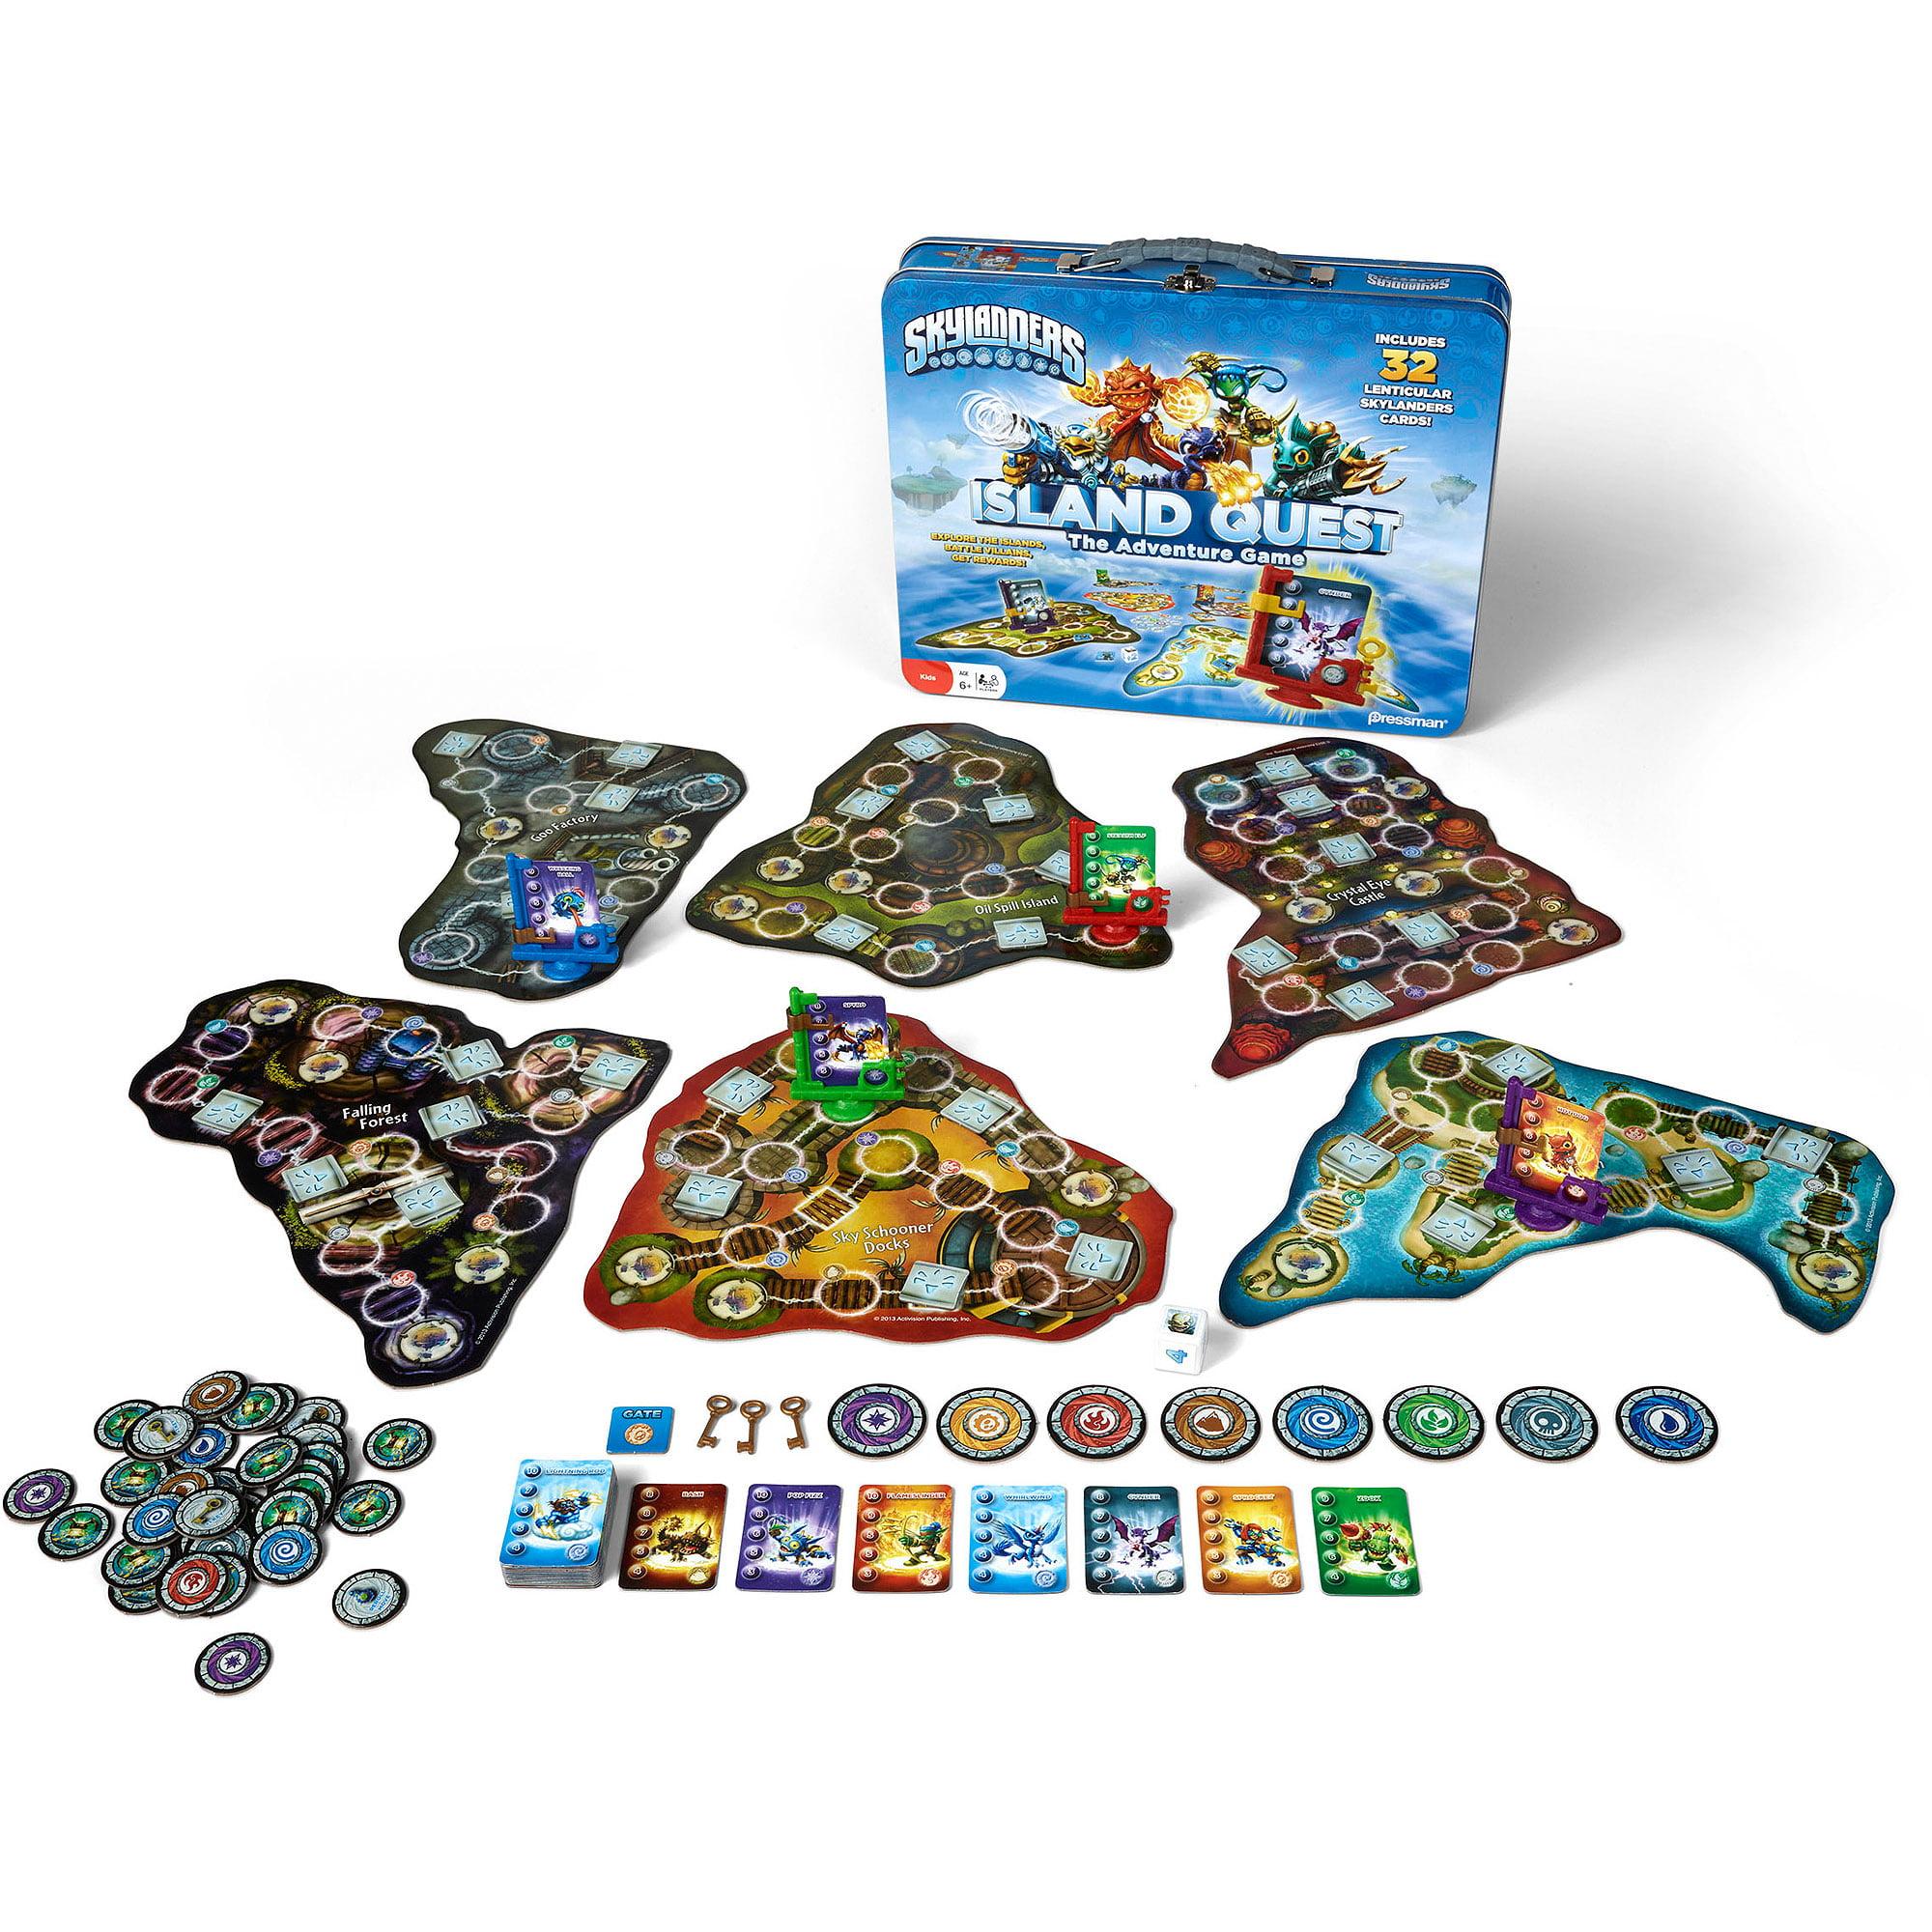 Pressman Toys Skylanders Island Quest Game by Generic